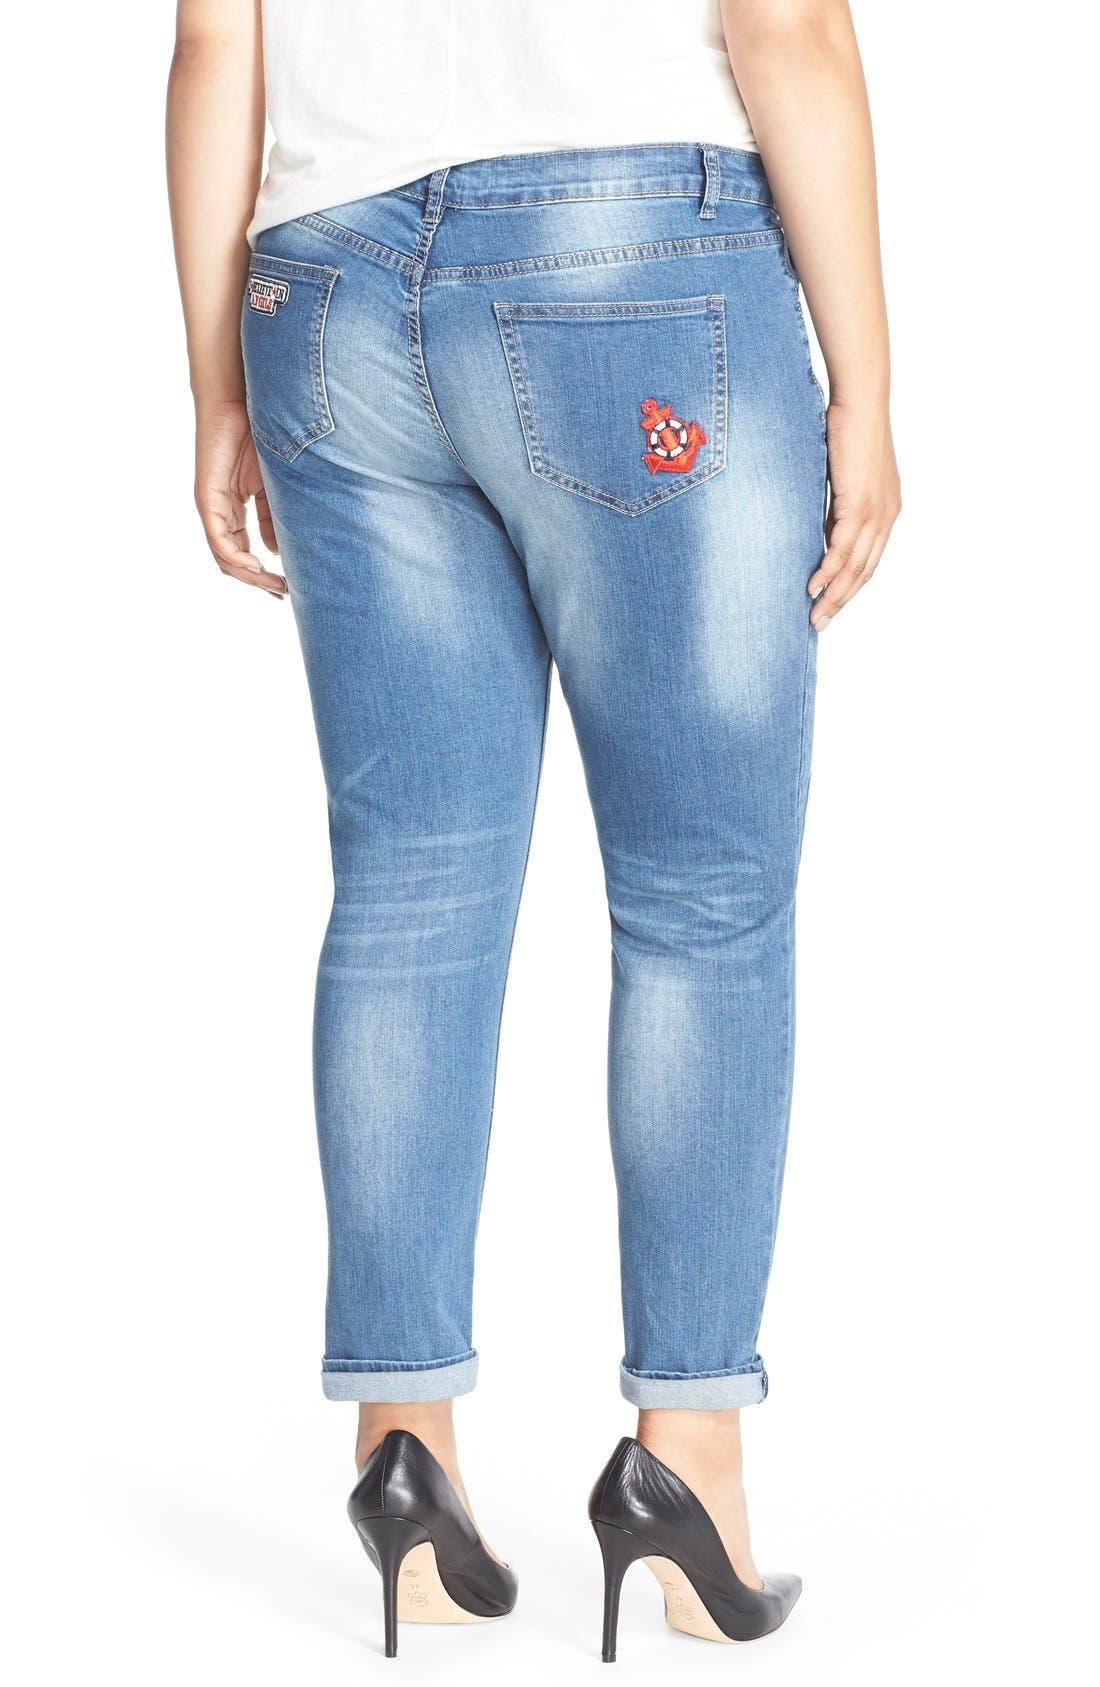 Alternate Image 3  - City Chic '80s Girl' Patch Detail Distressed Roll Cuff Jeans (Dark Denim) (Plus Size)